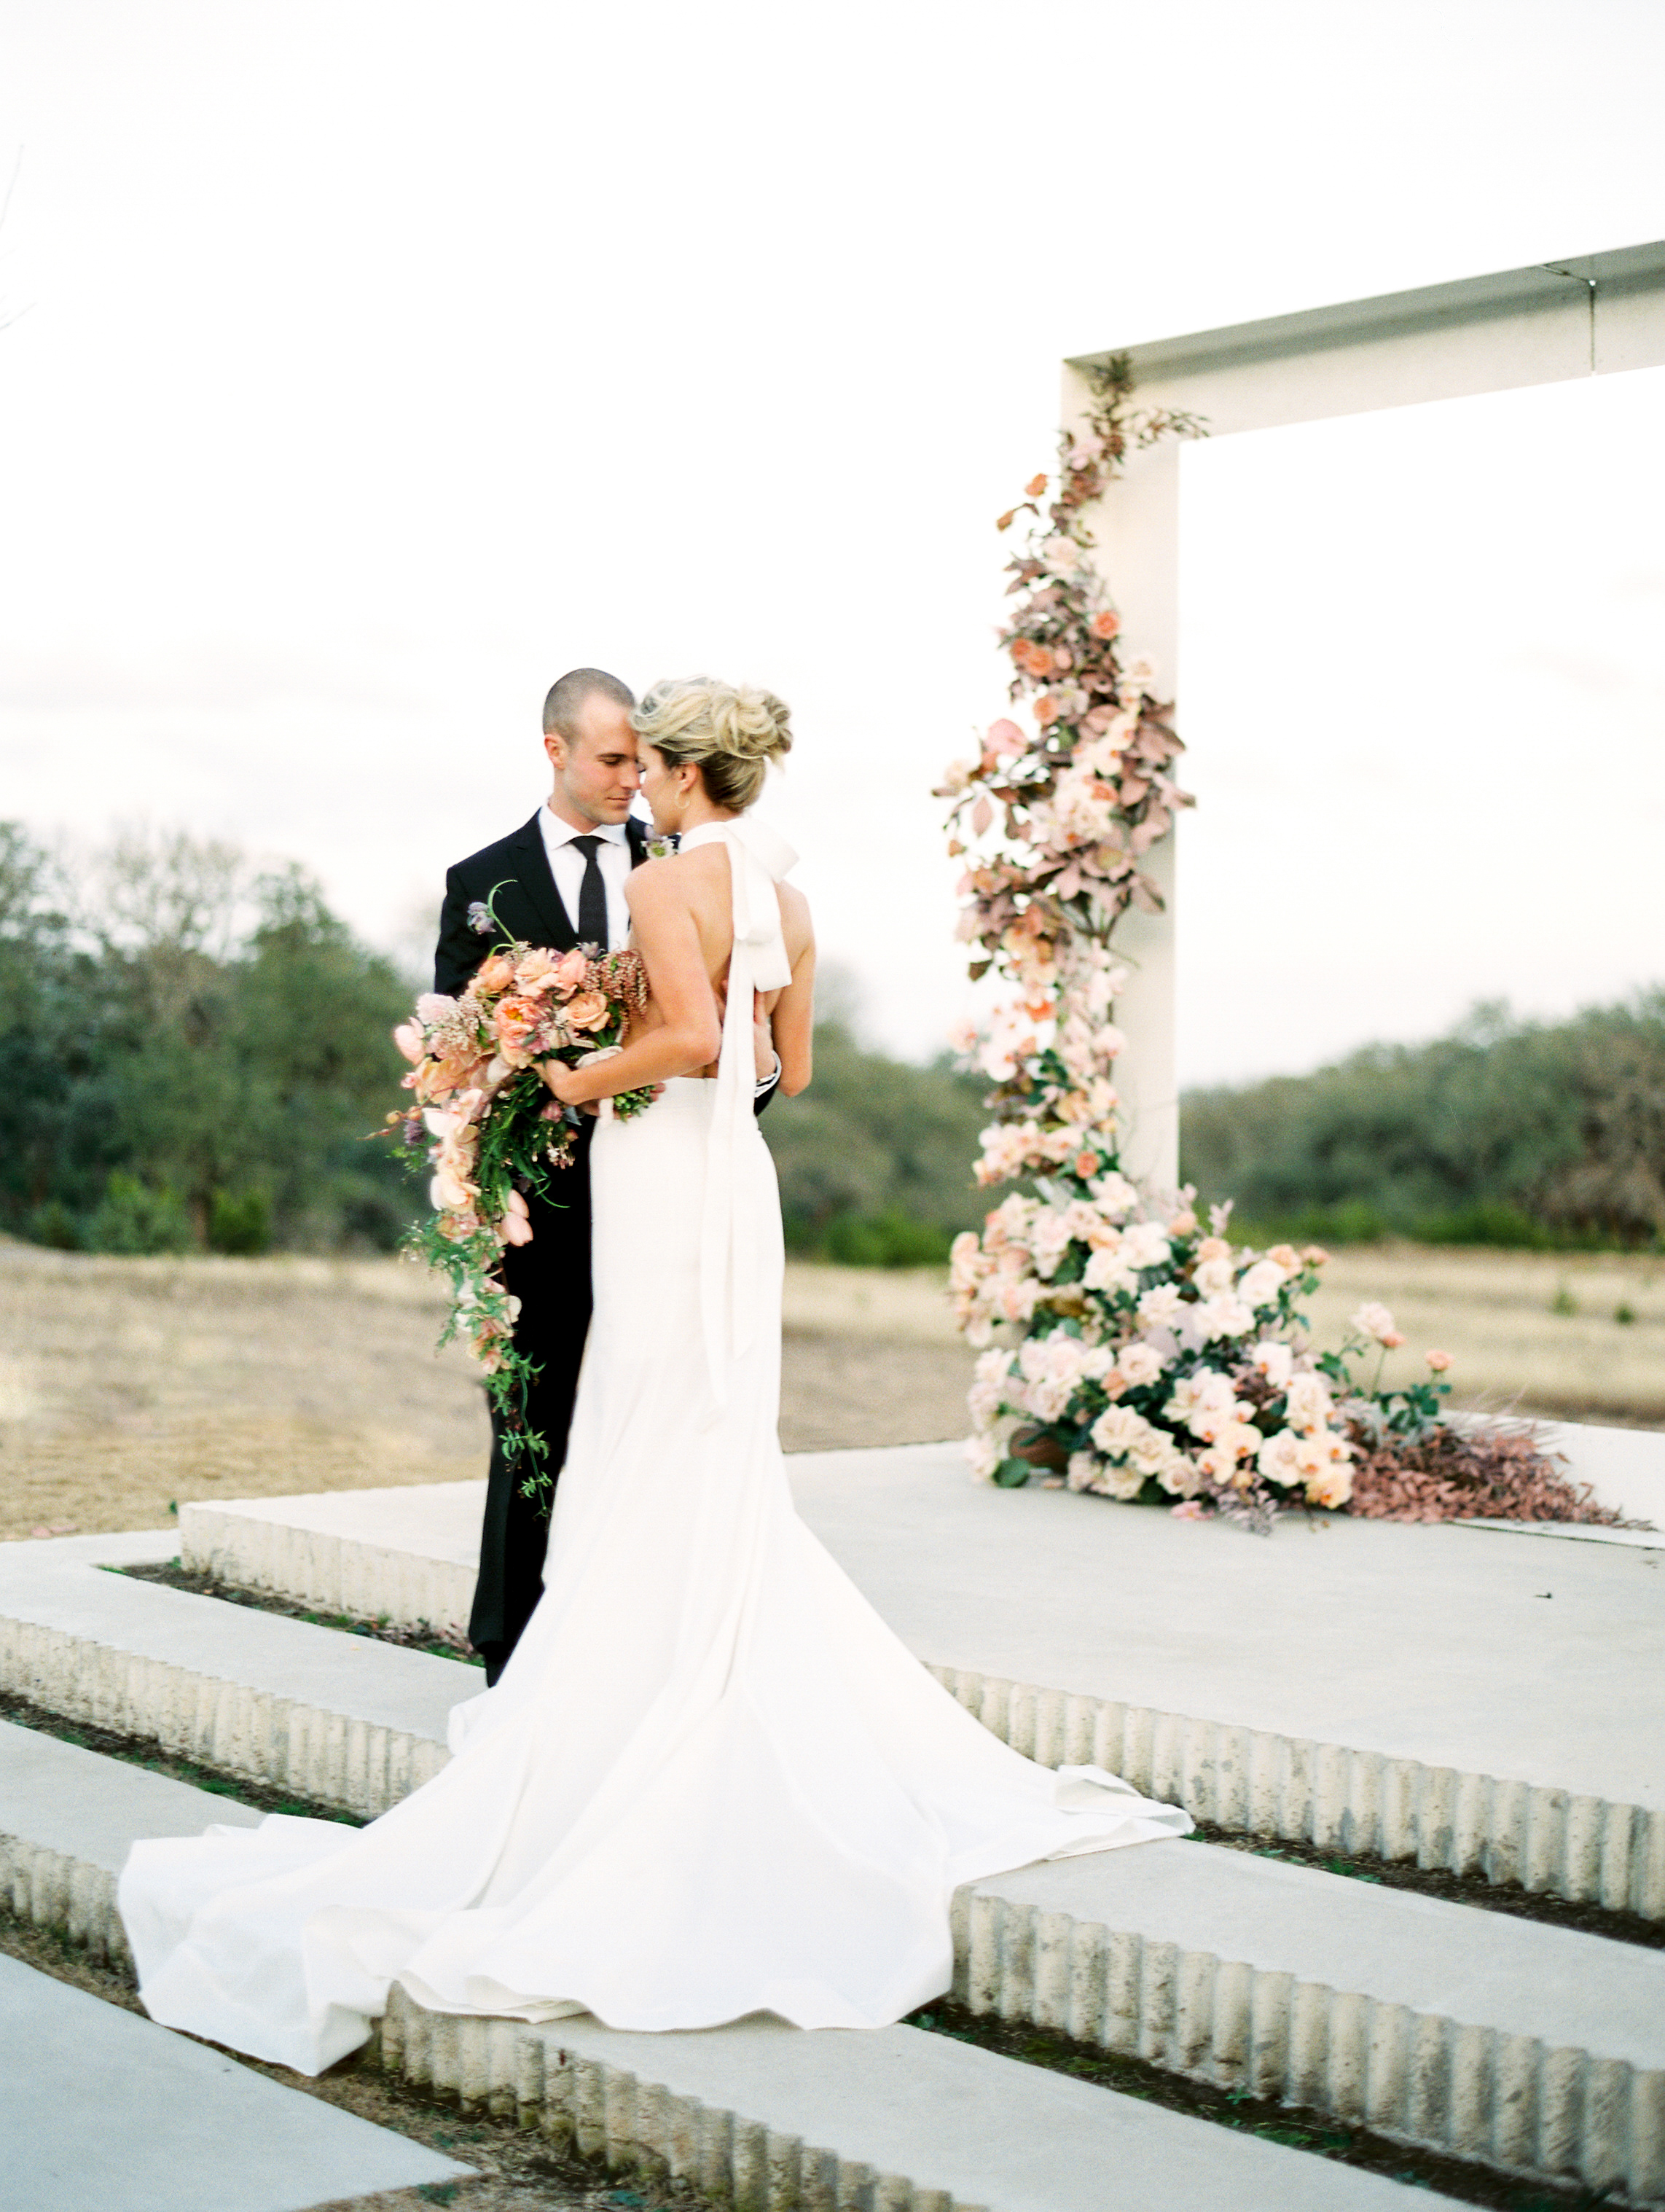 Austin-Wedding-Photography-Prospect-House-Fine-Art-Film-Destination-Dana-Josh-Fernandez-Photography-Dallas-Houston-Luxury-Best-Top-10.jpg